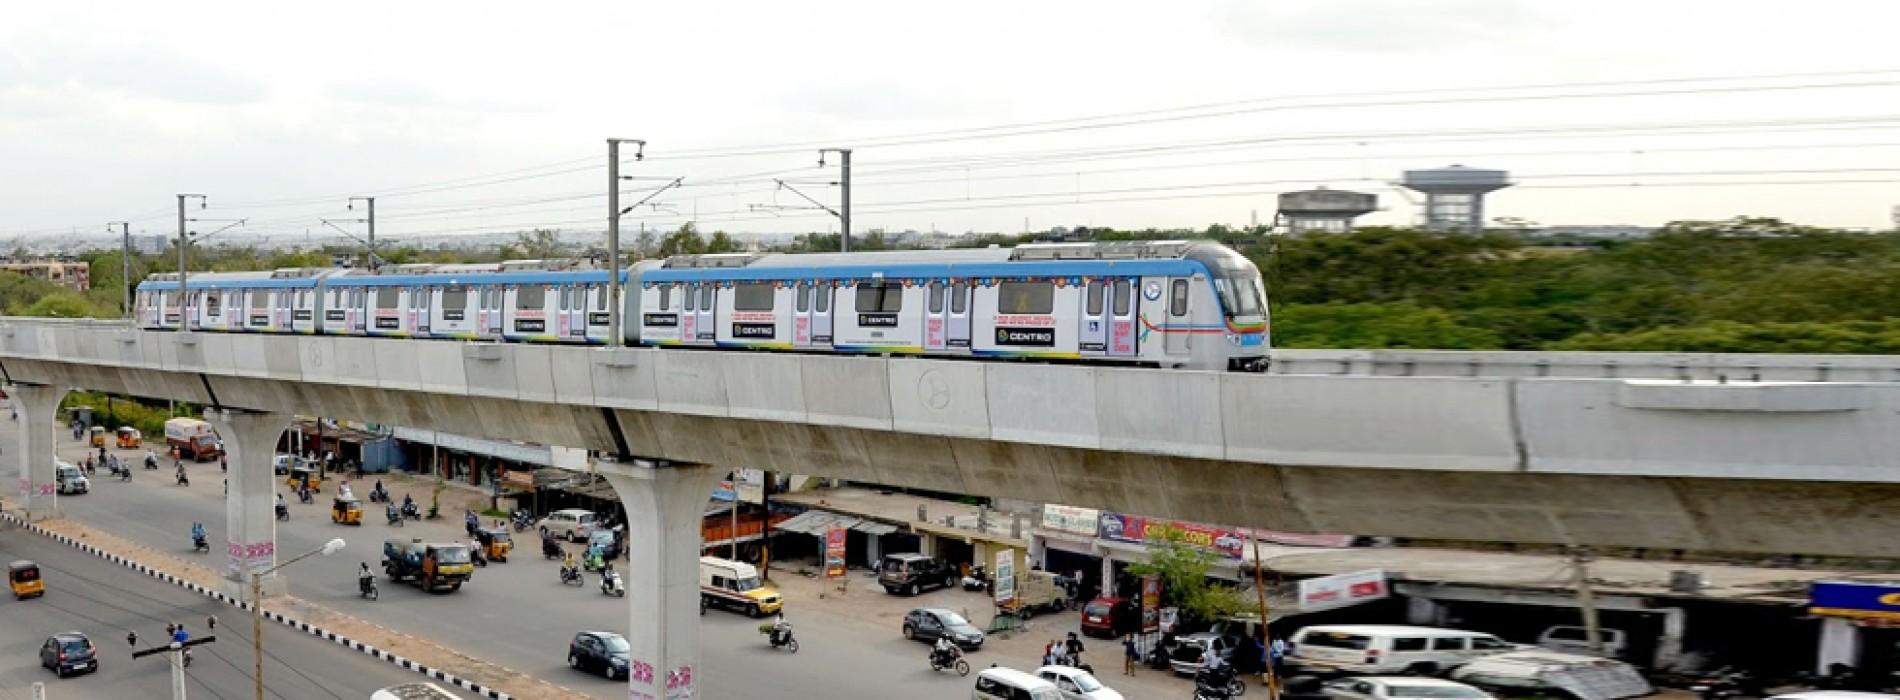 Narendra Modi to inaugurate Hyderabad metro rail on November 28